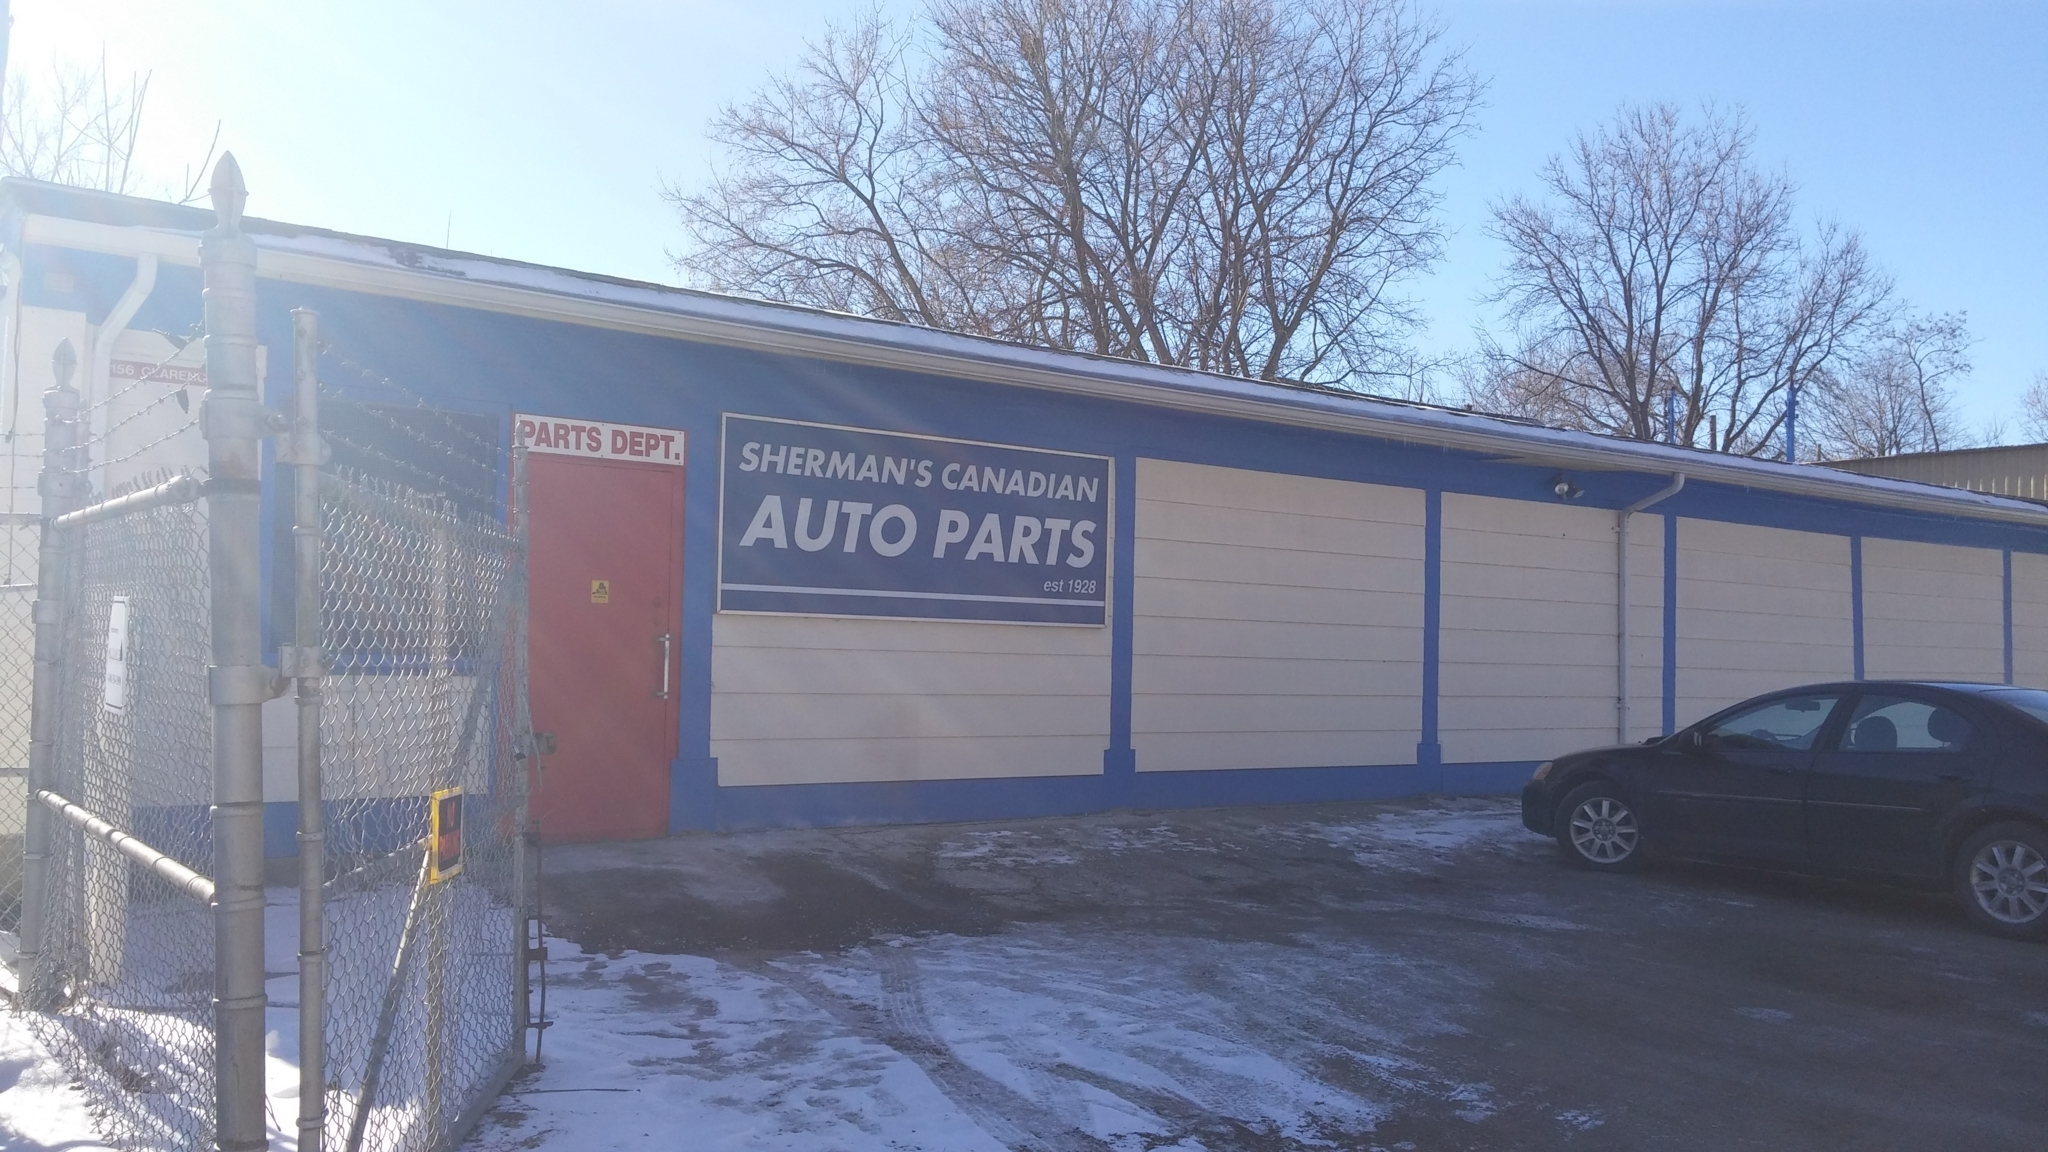 Auto Value-Sherman's Canadian in Brantford